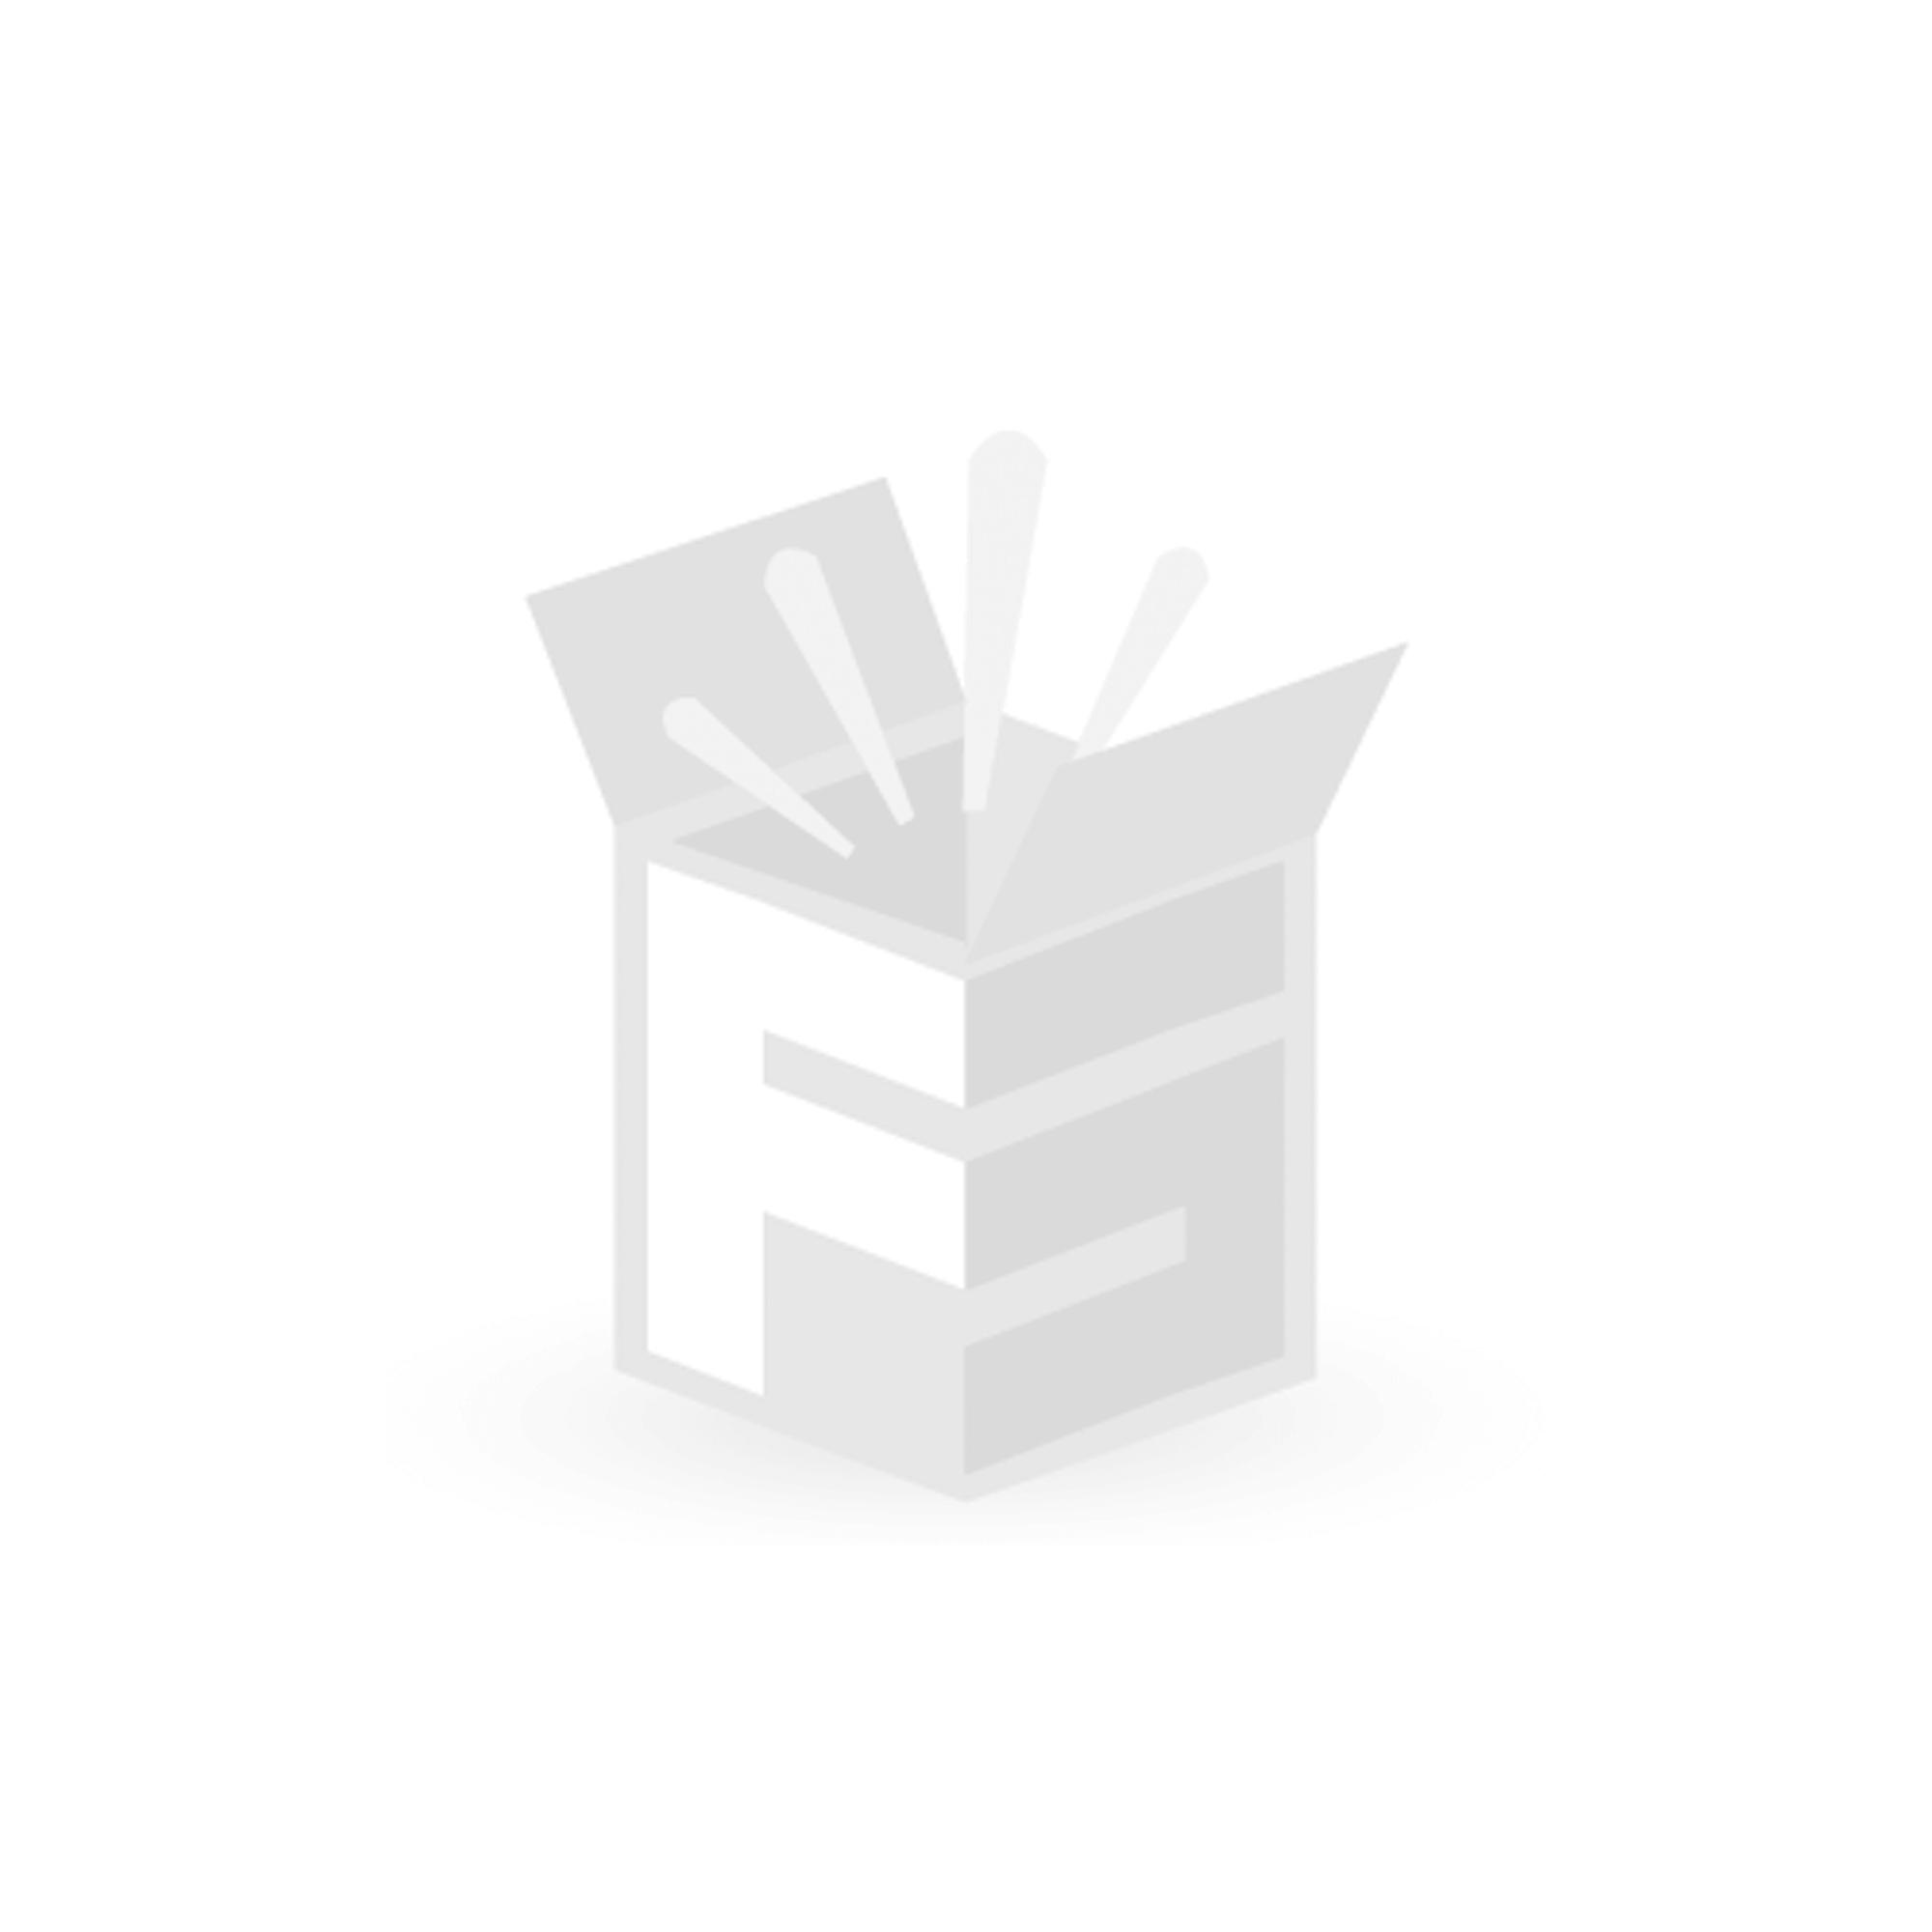 FS-STAR Moules à muffin en silicone, 8 pièces